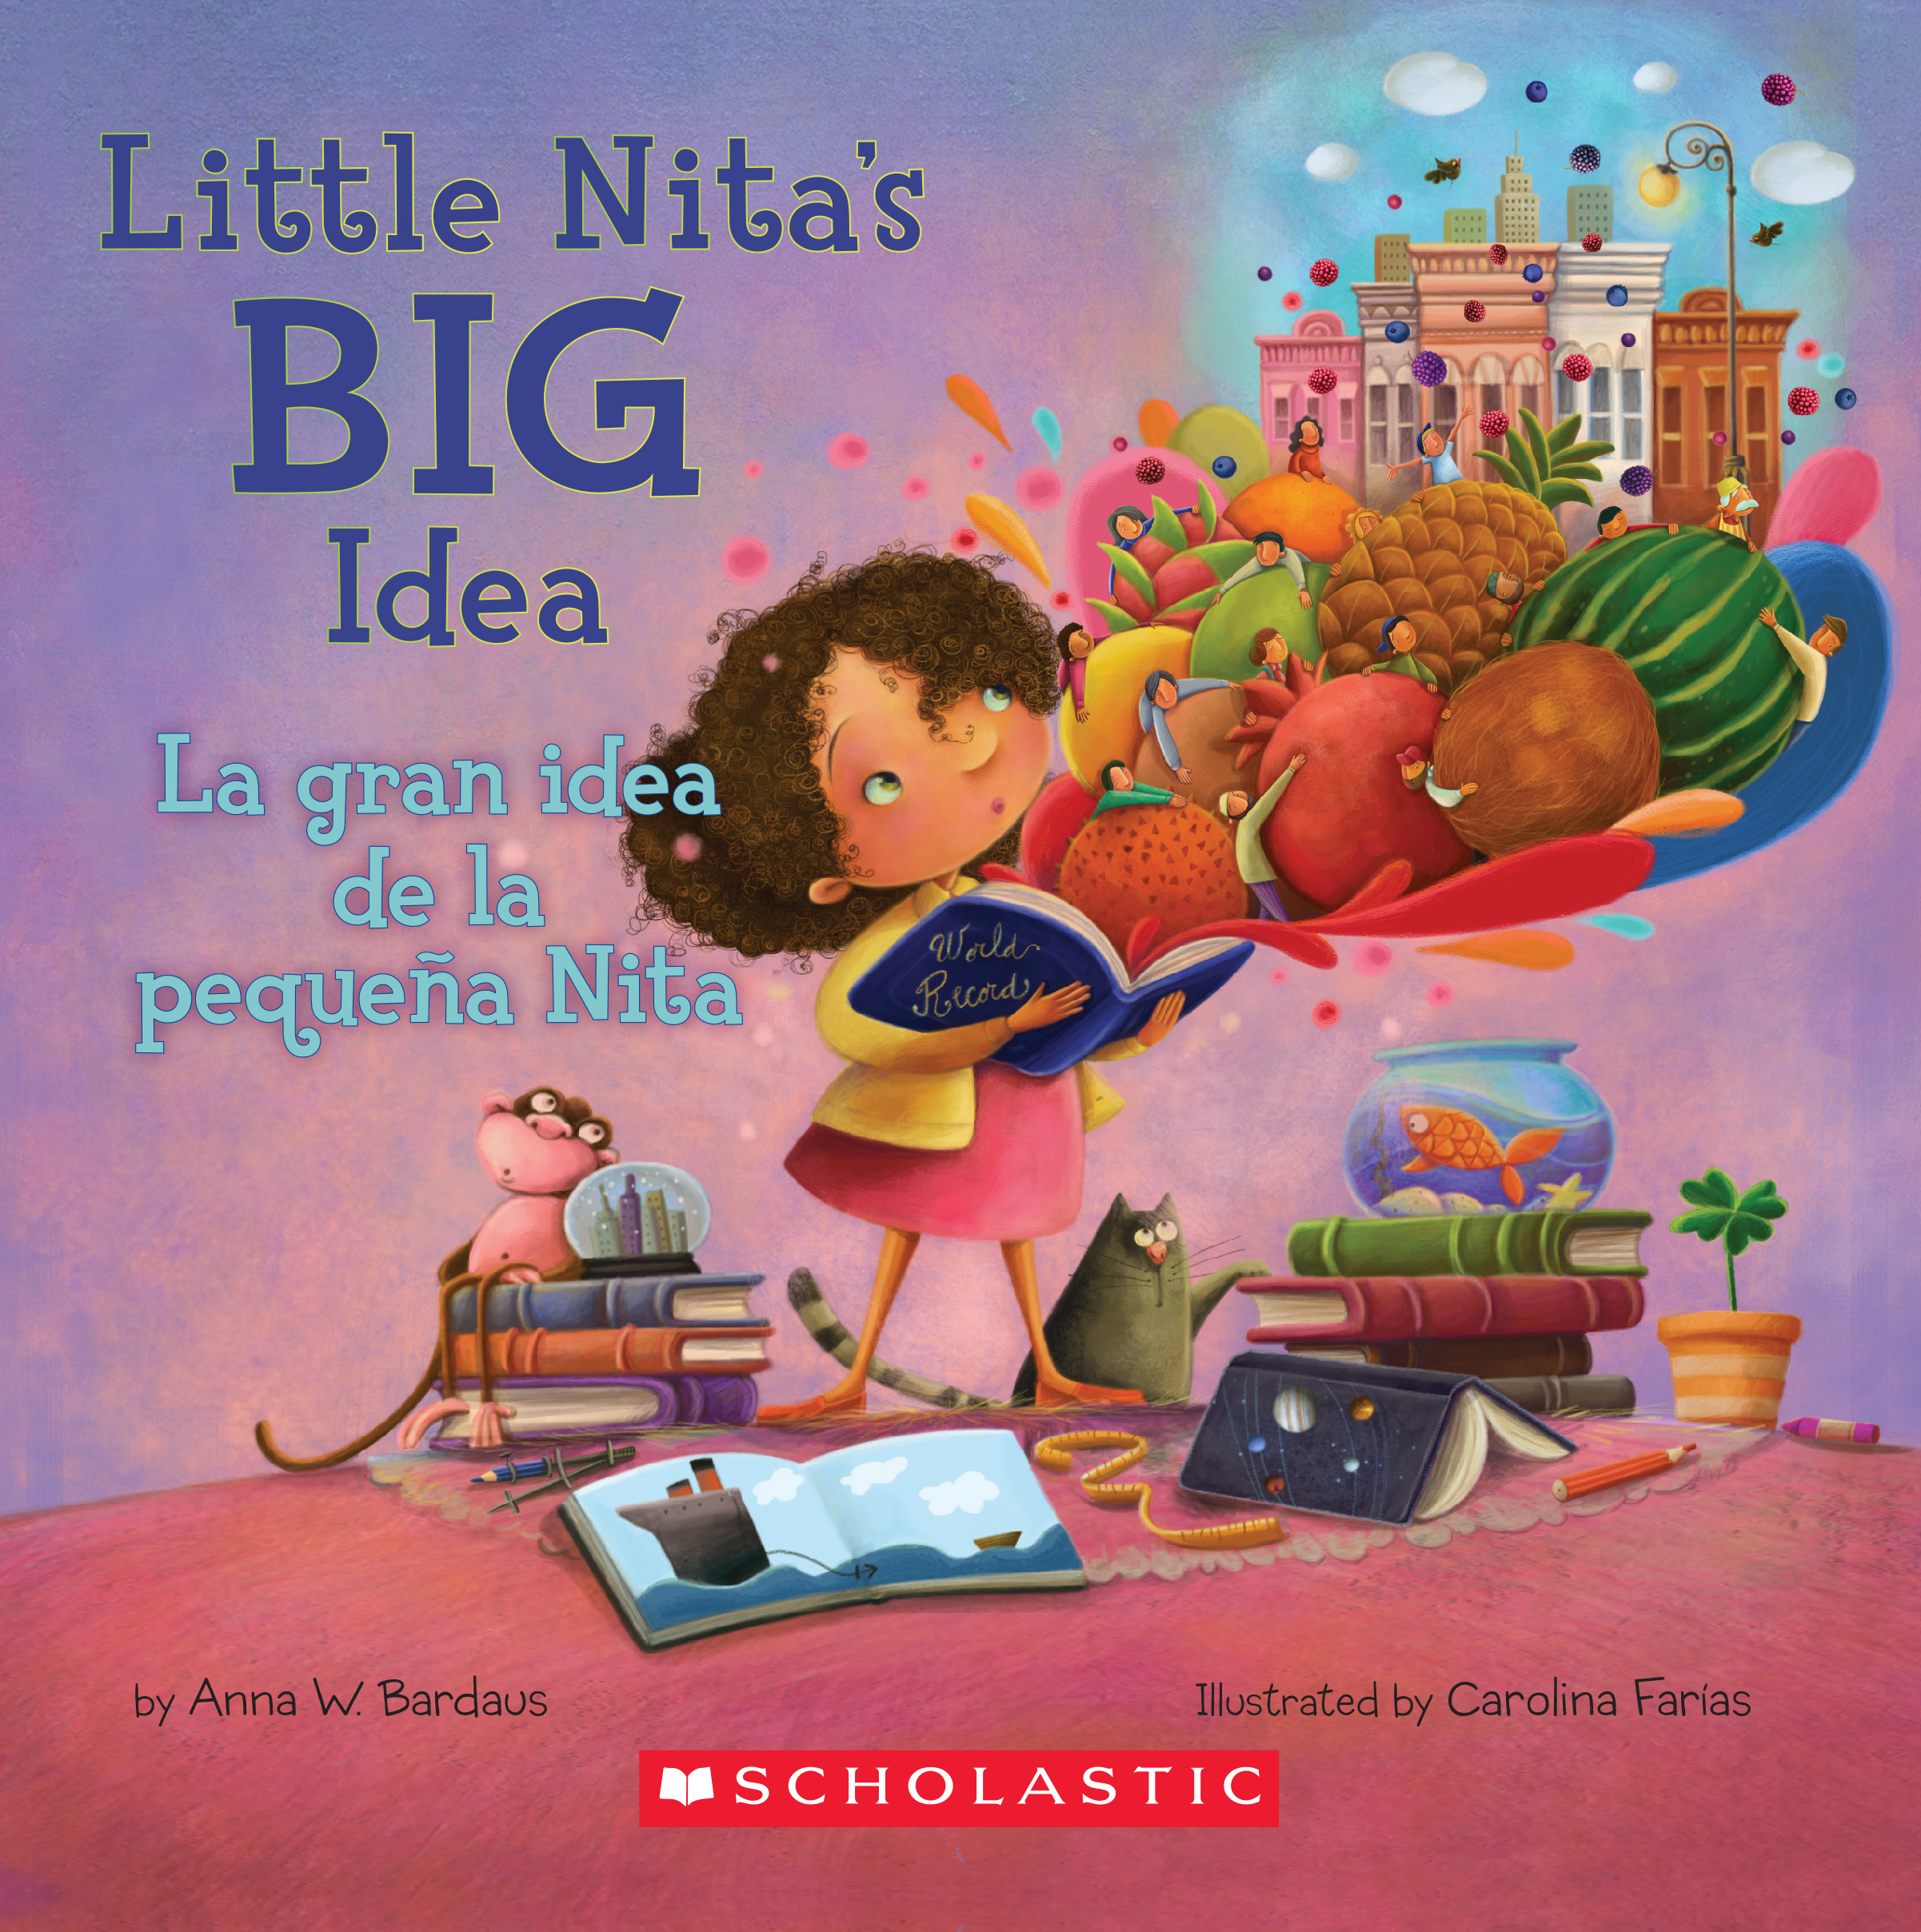 Little Nita's Big Idea